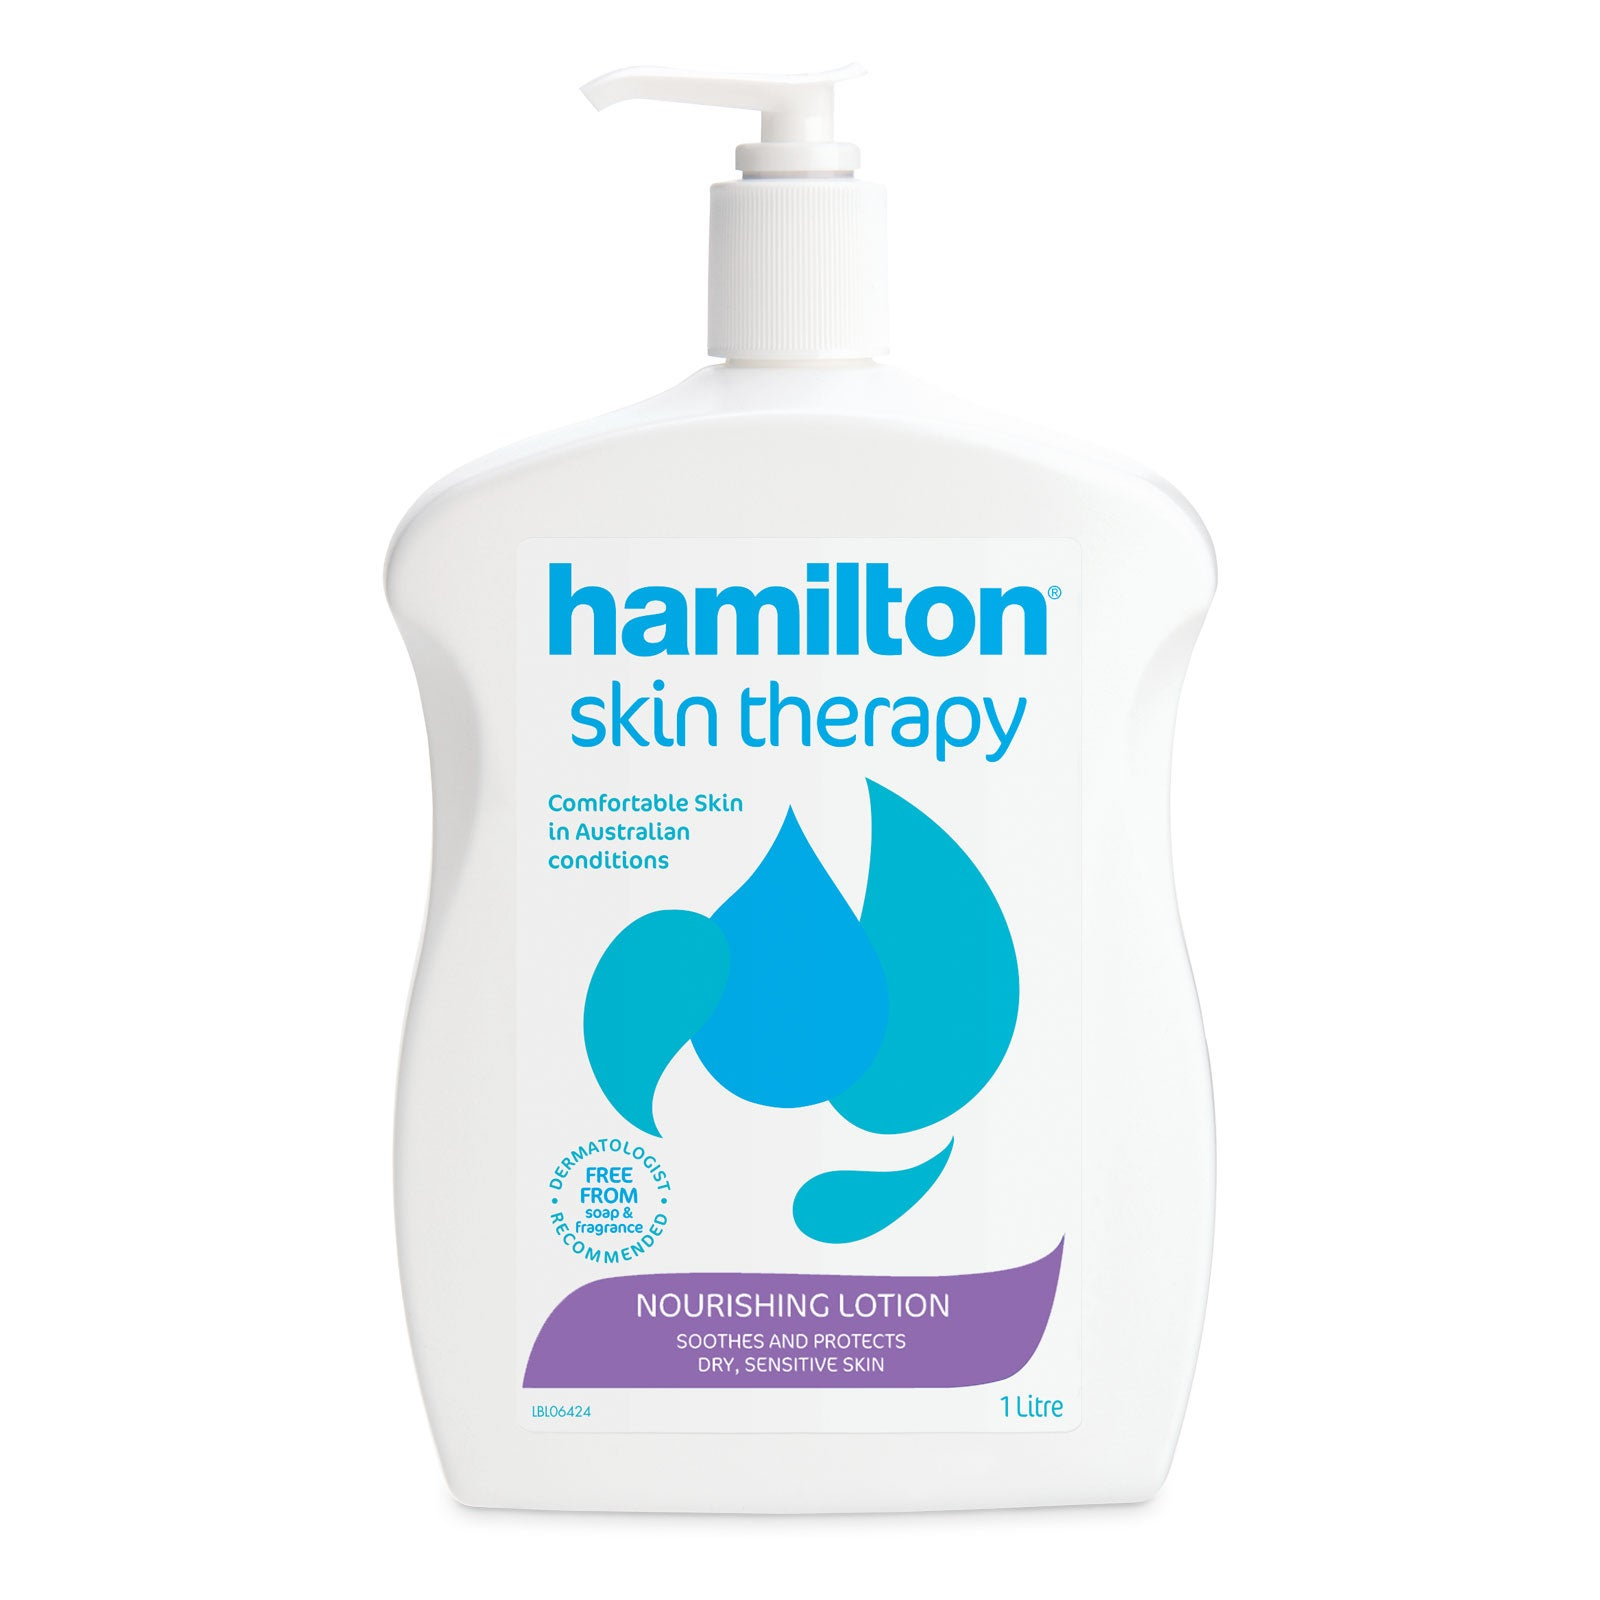 Hamilton Skin Therapy Nourishing Lotion 1 Litre